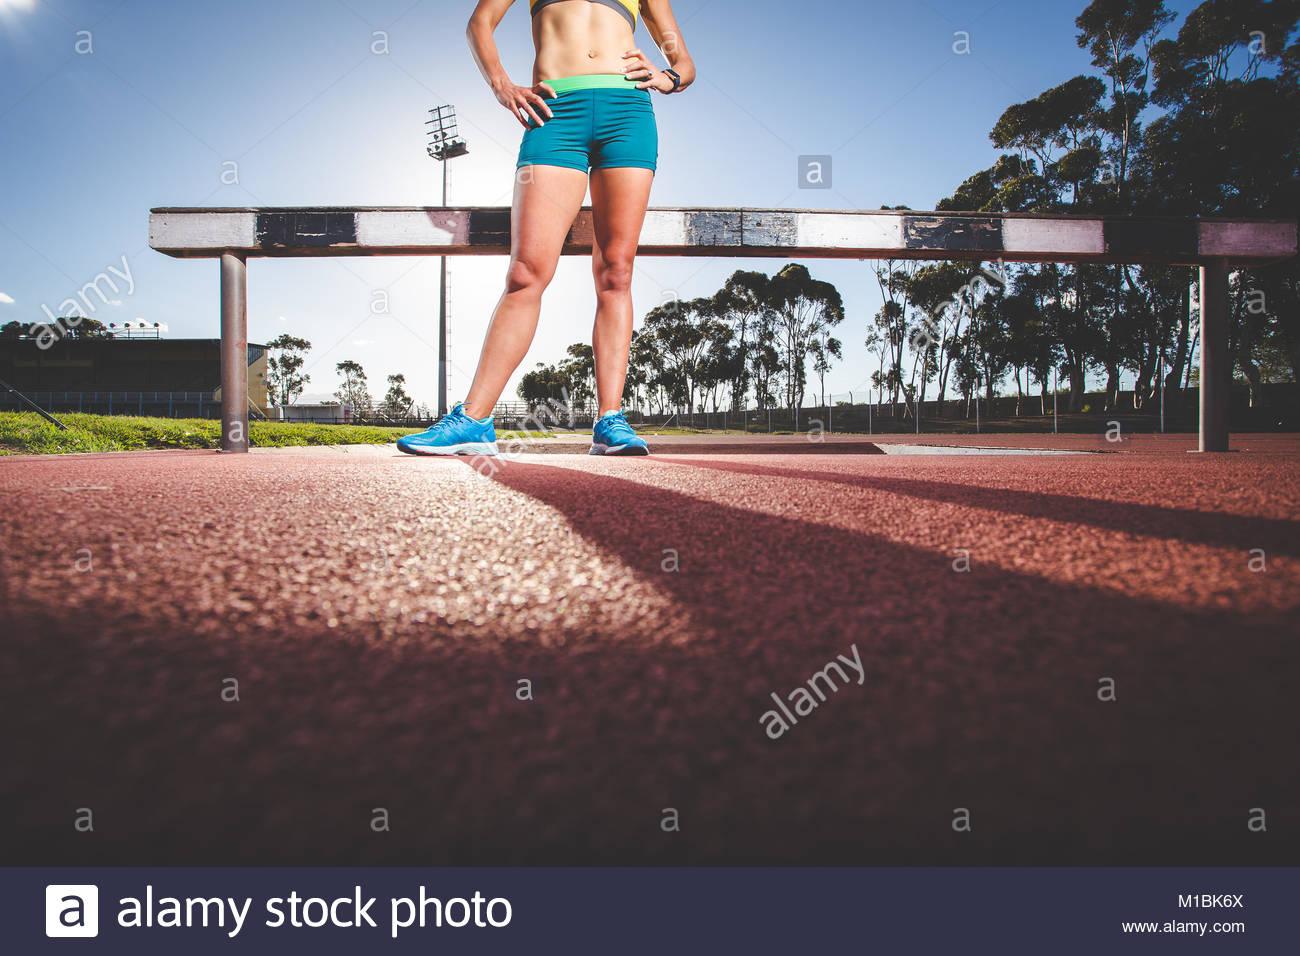 female-fitness-model-and-track-athlete-sprinting-on-an-athletics-track-M1BK6X.jpg